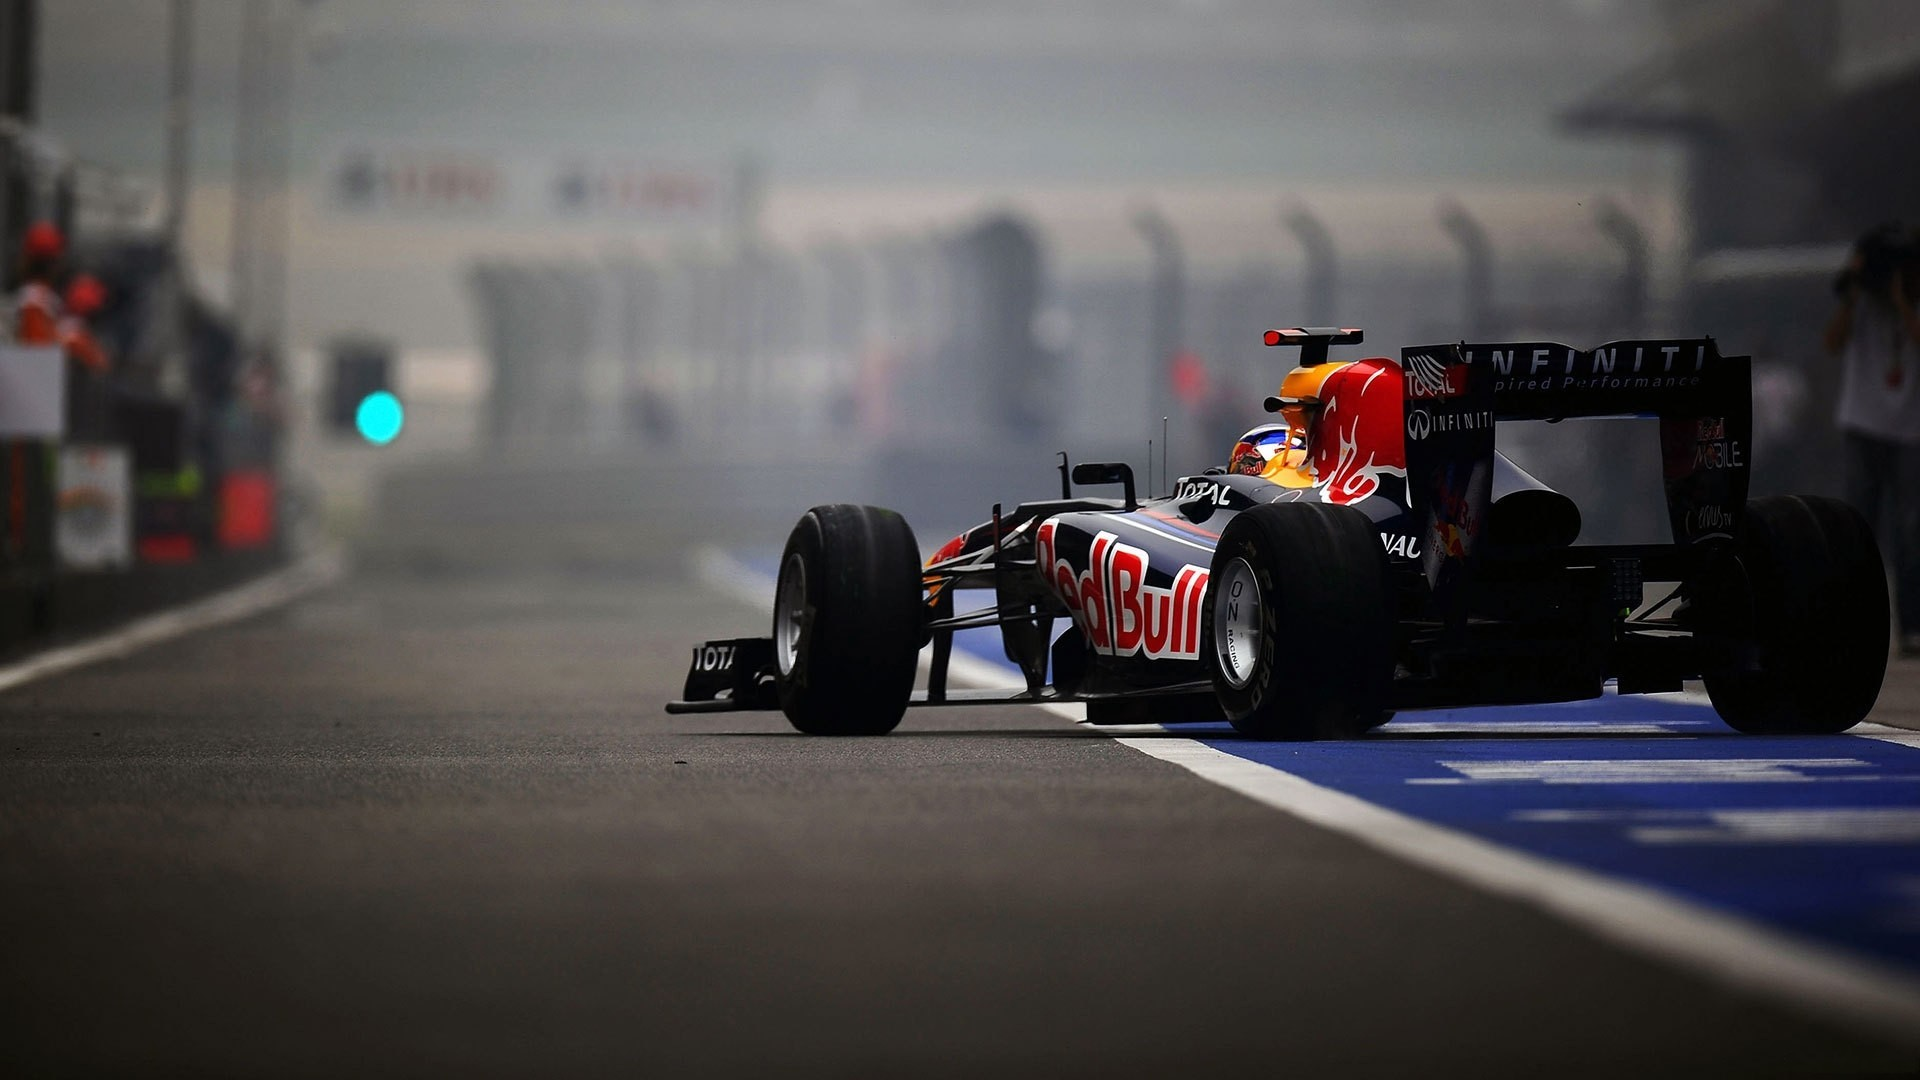 … F1 wallpaper 9 …